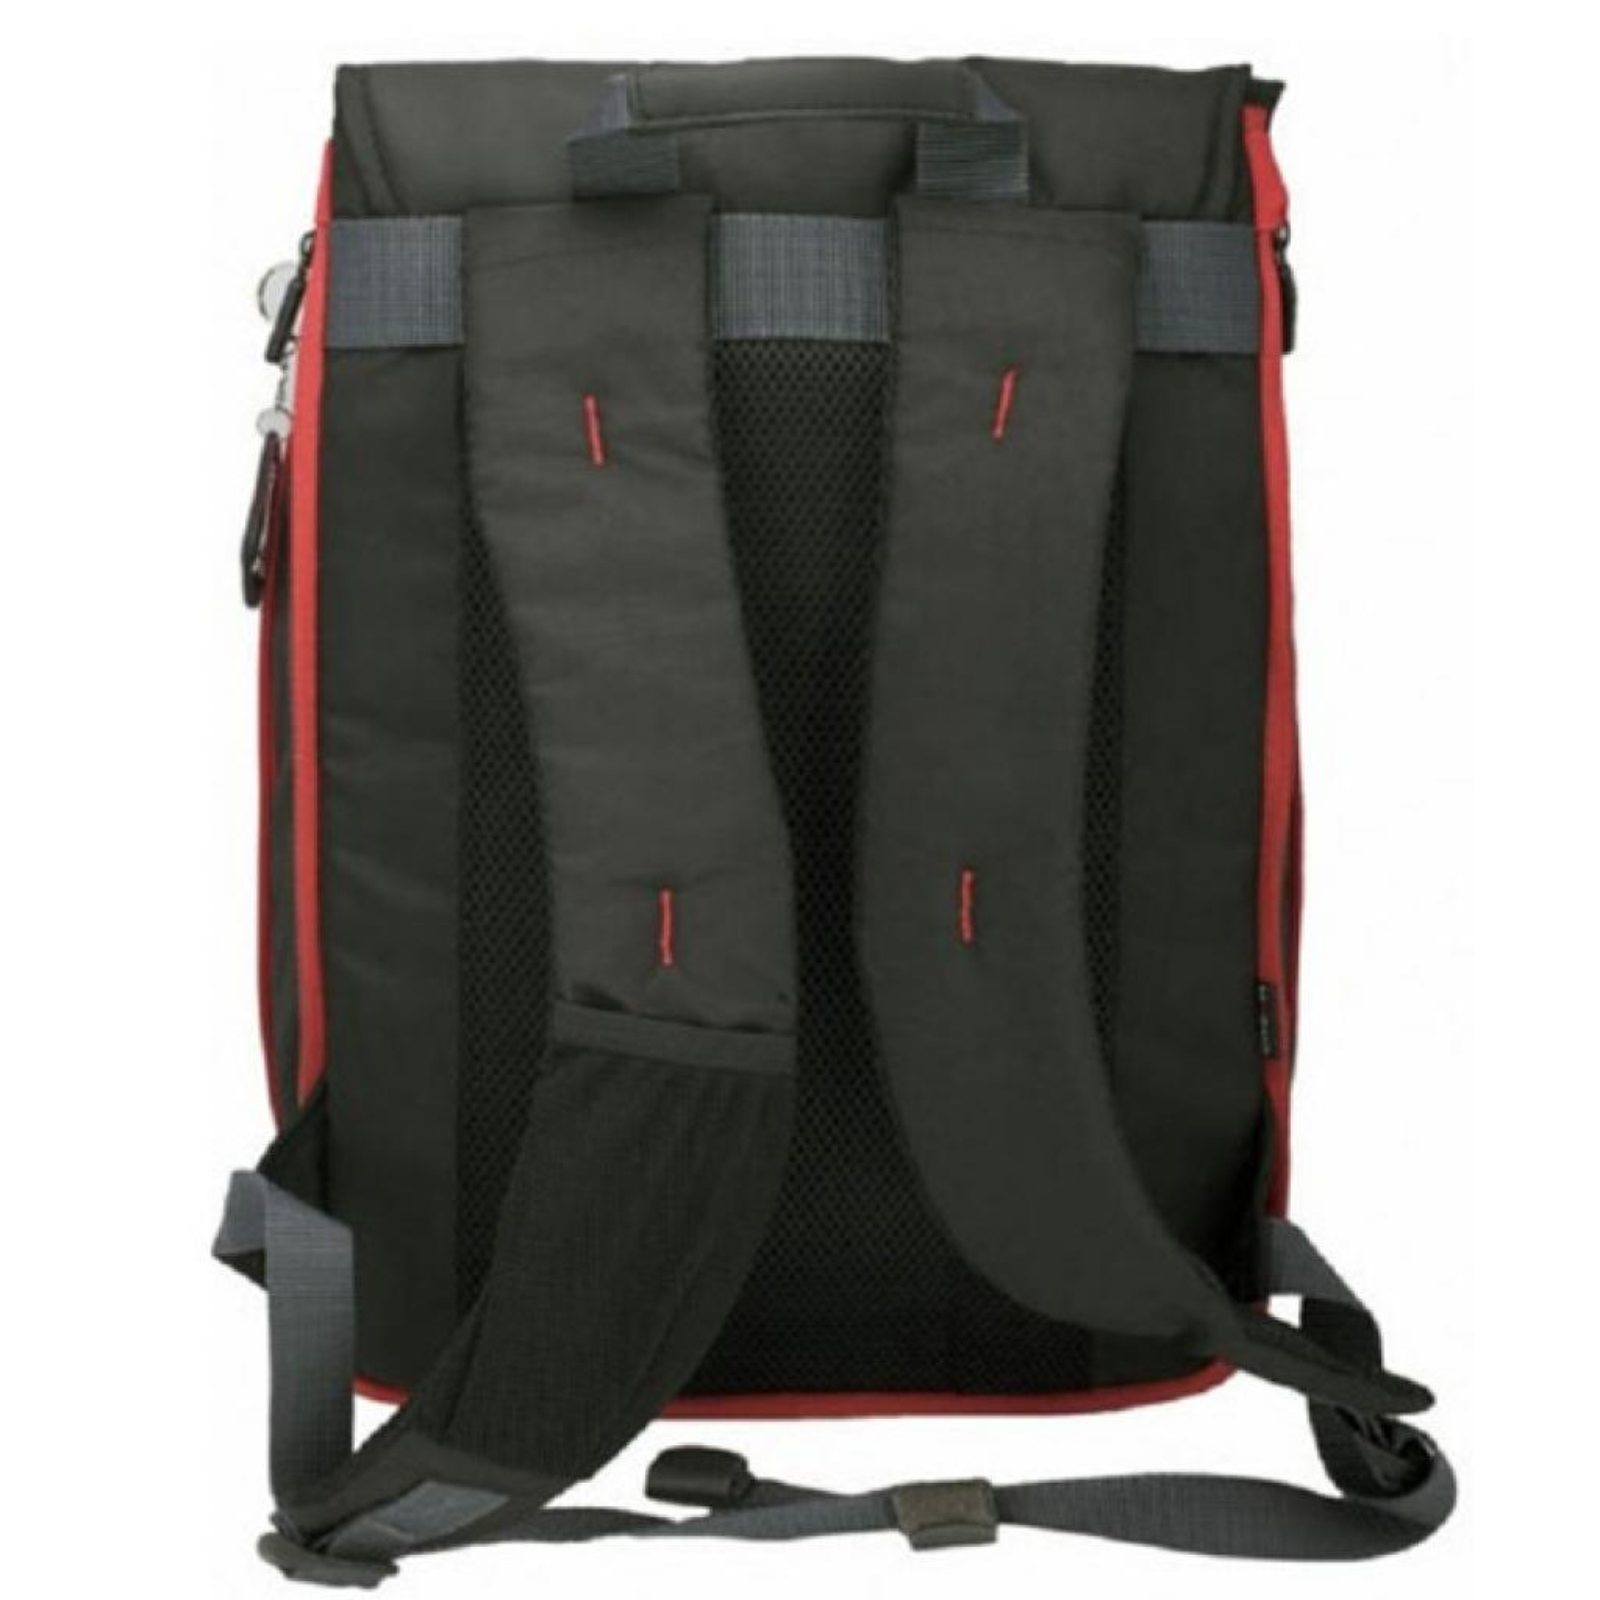 Рюкзак для ноутбука Crown 15.6 Harmony black and red (BPH3315BR) изображение 4